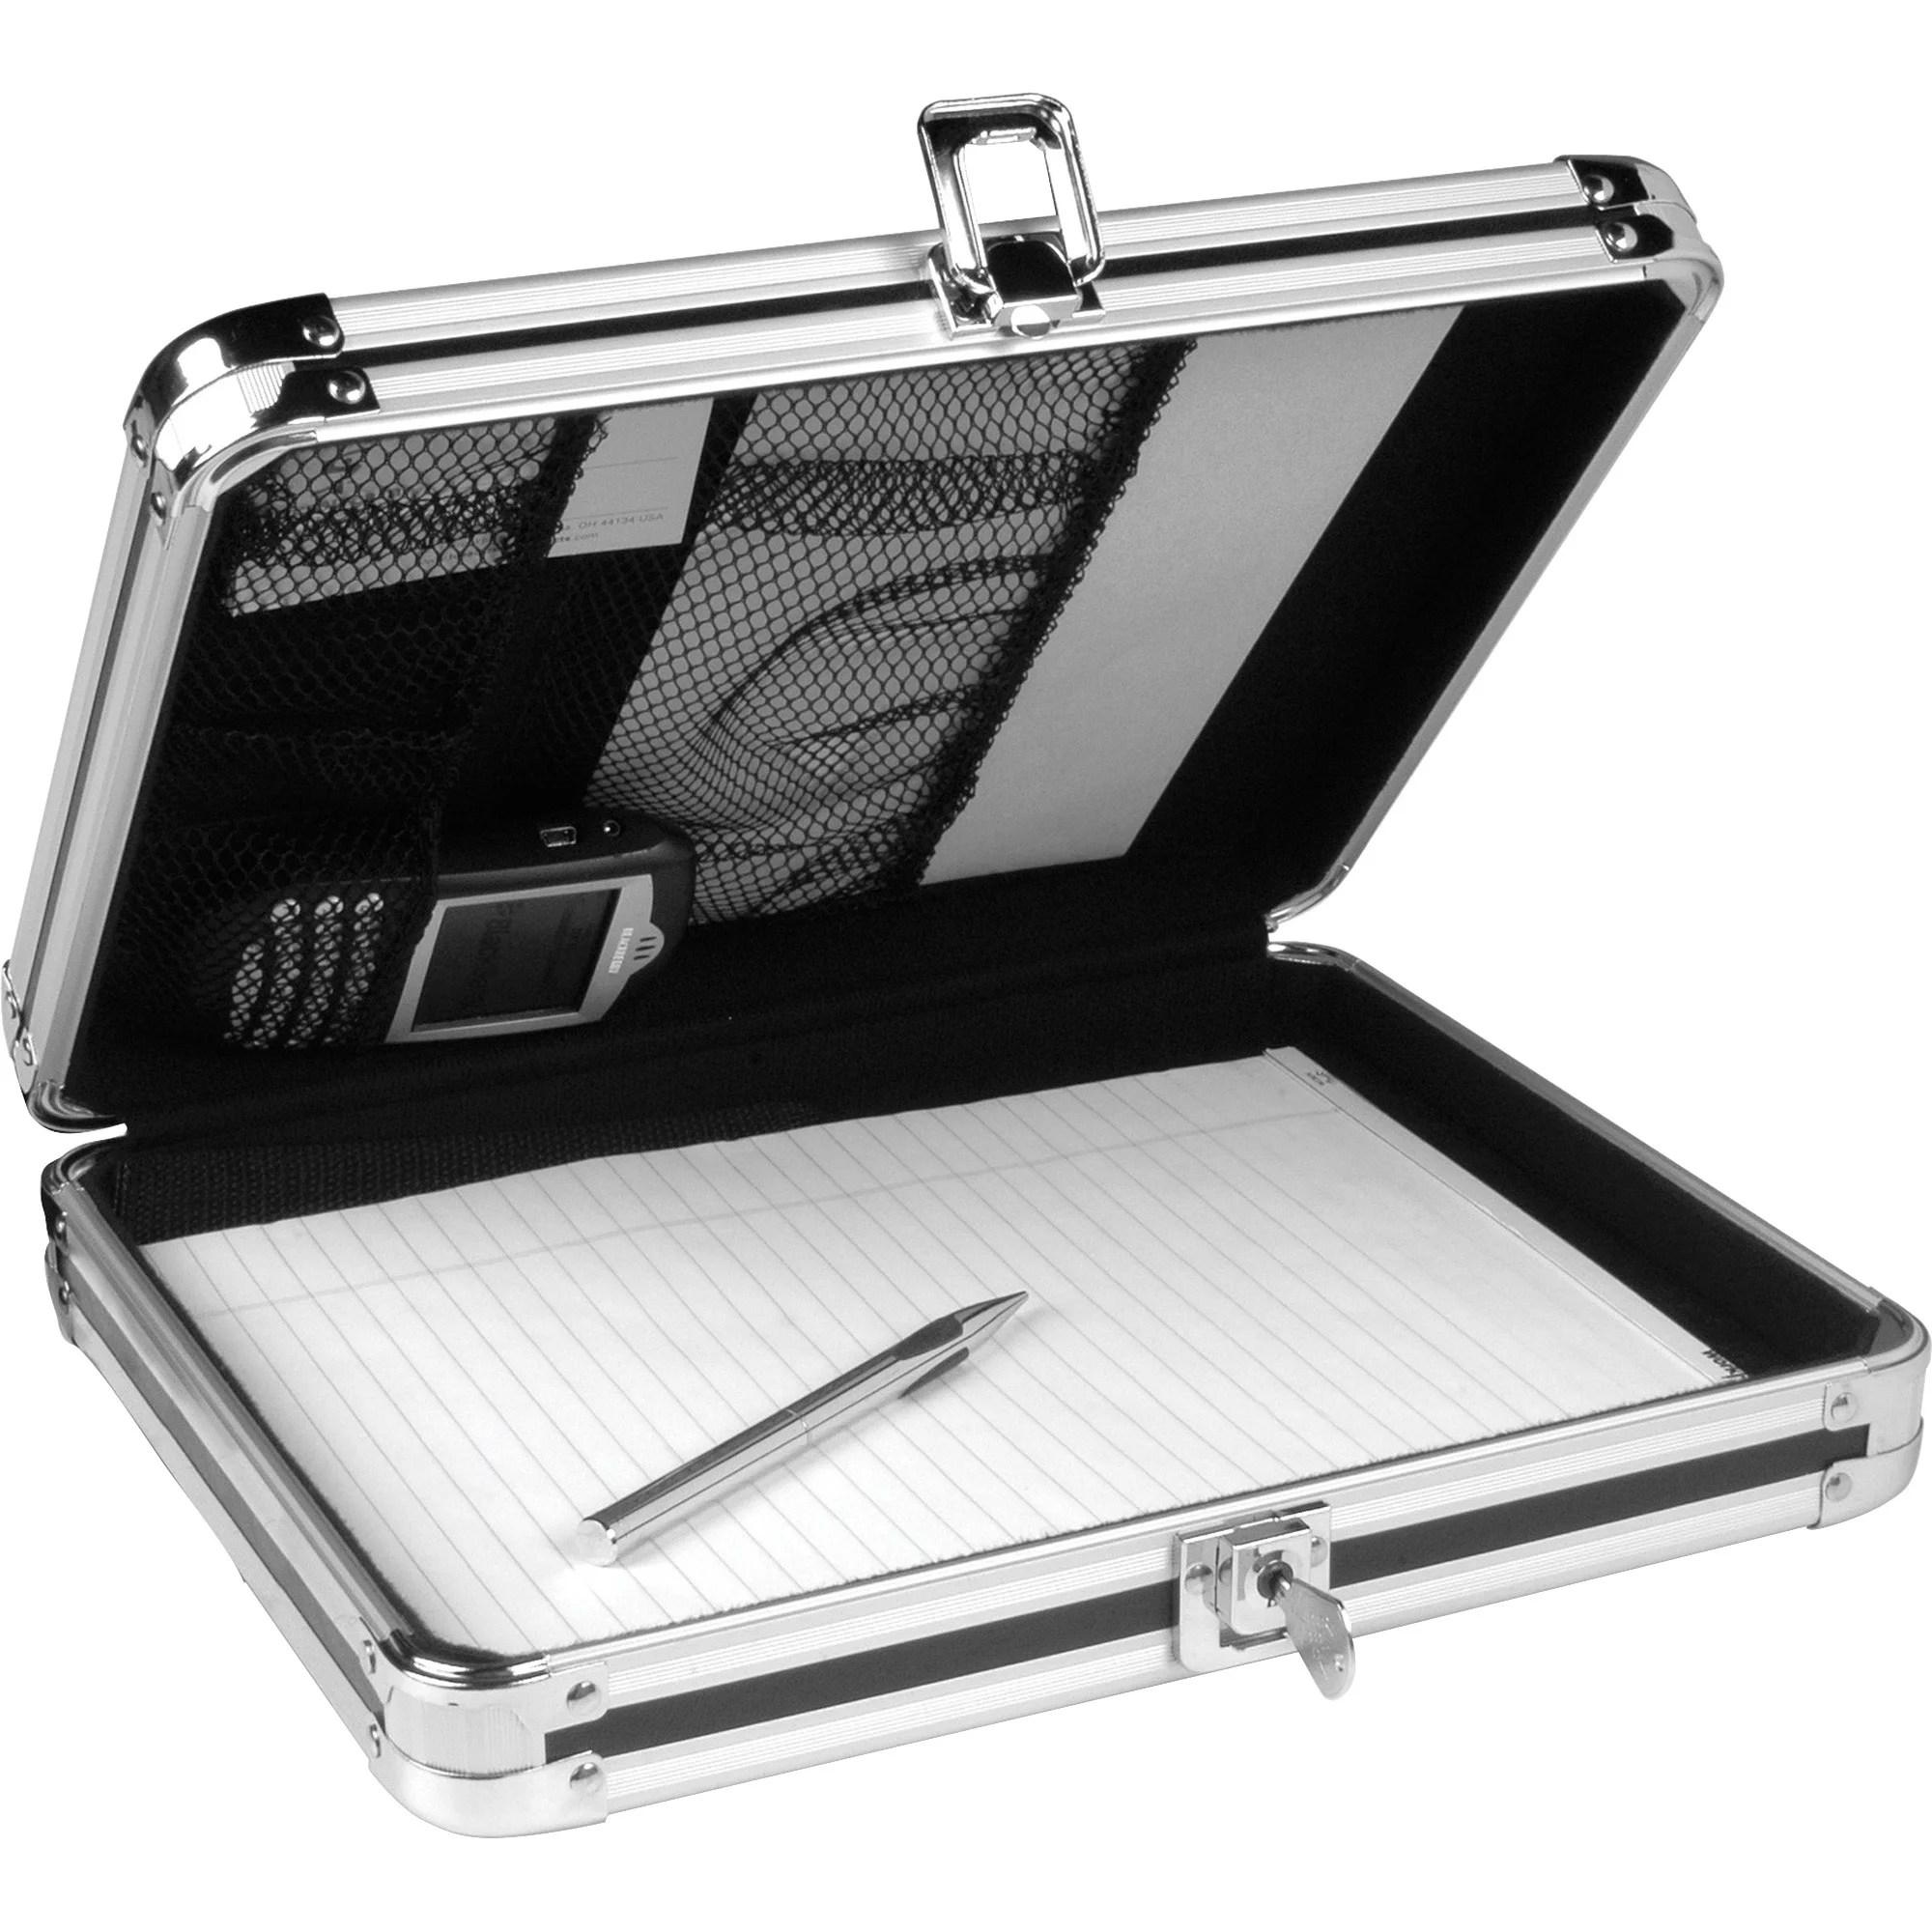 vaultz locking storage clipboard black chrome 1 each quantity